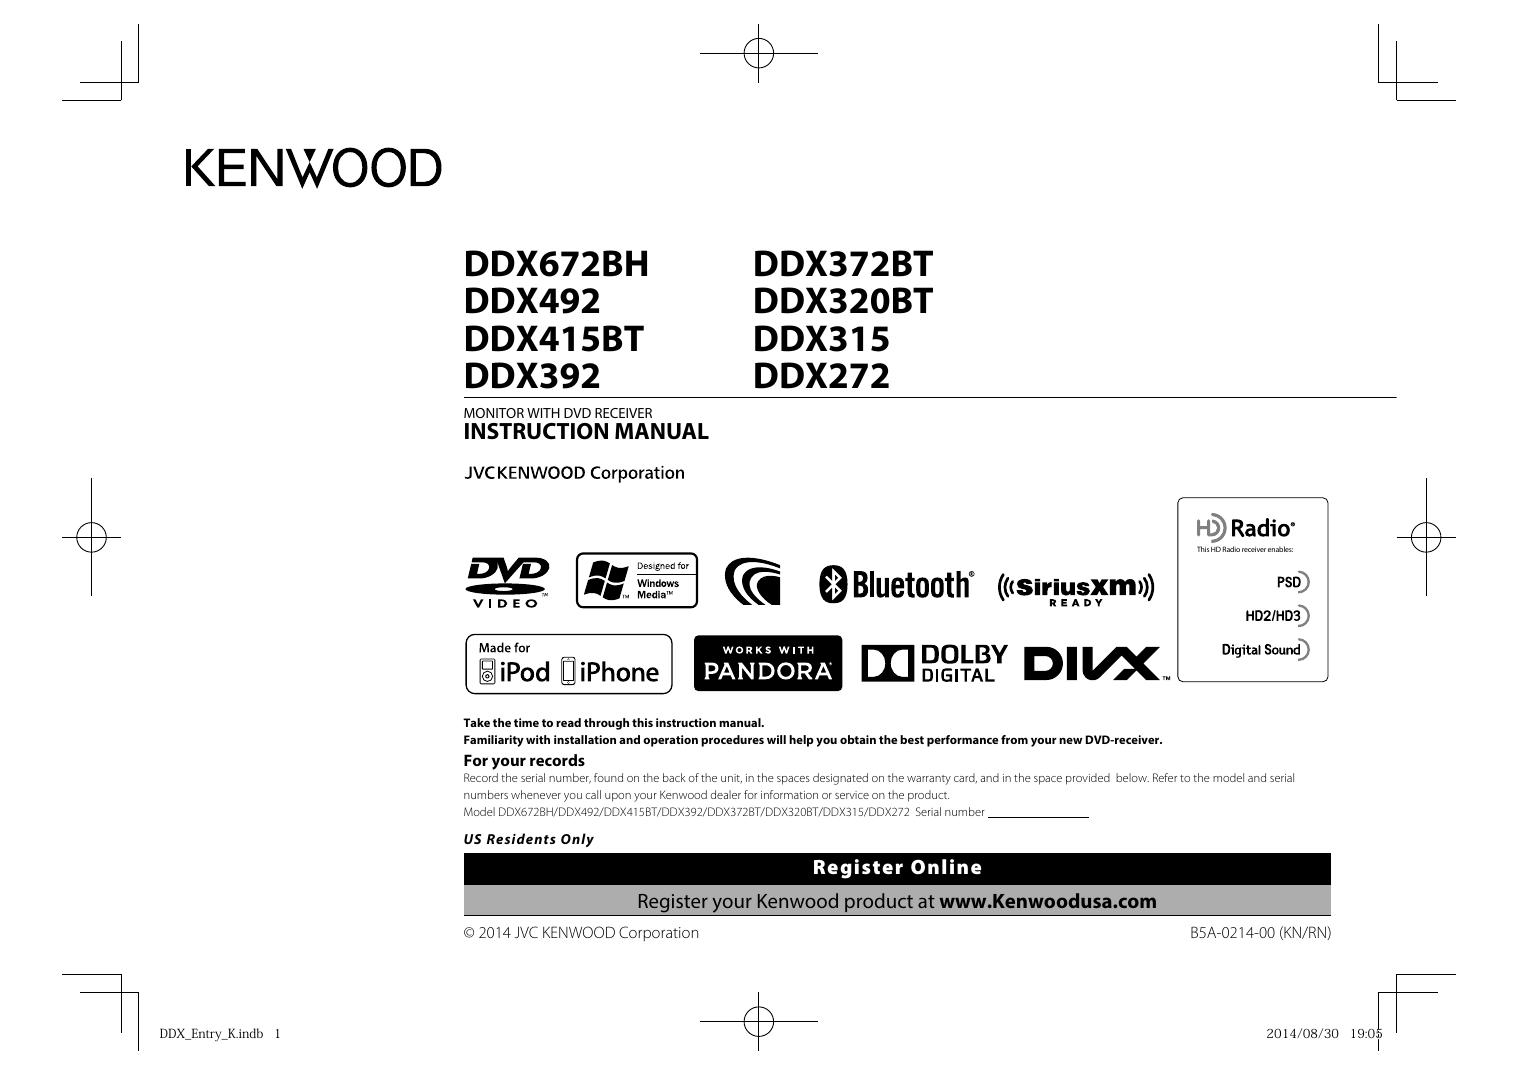 on ddx672bh kenwood wiring harness